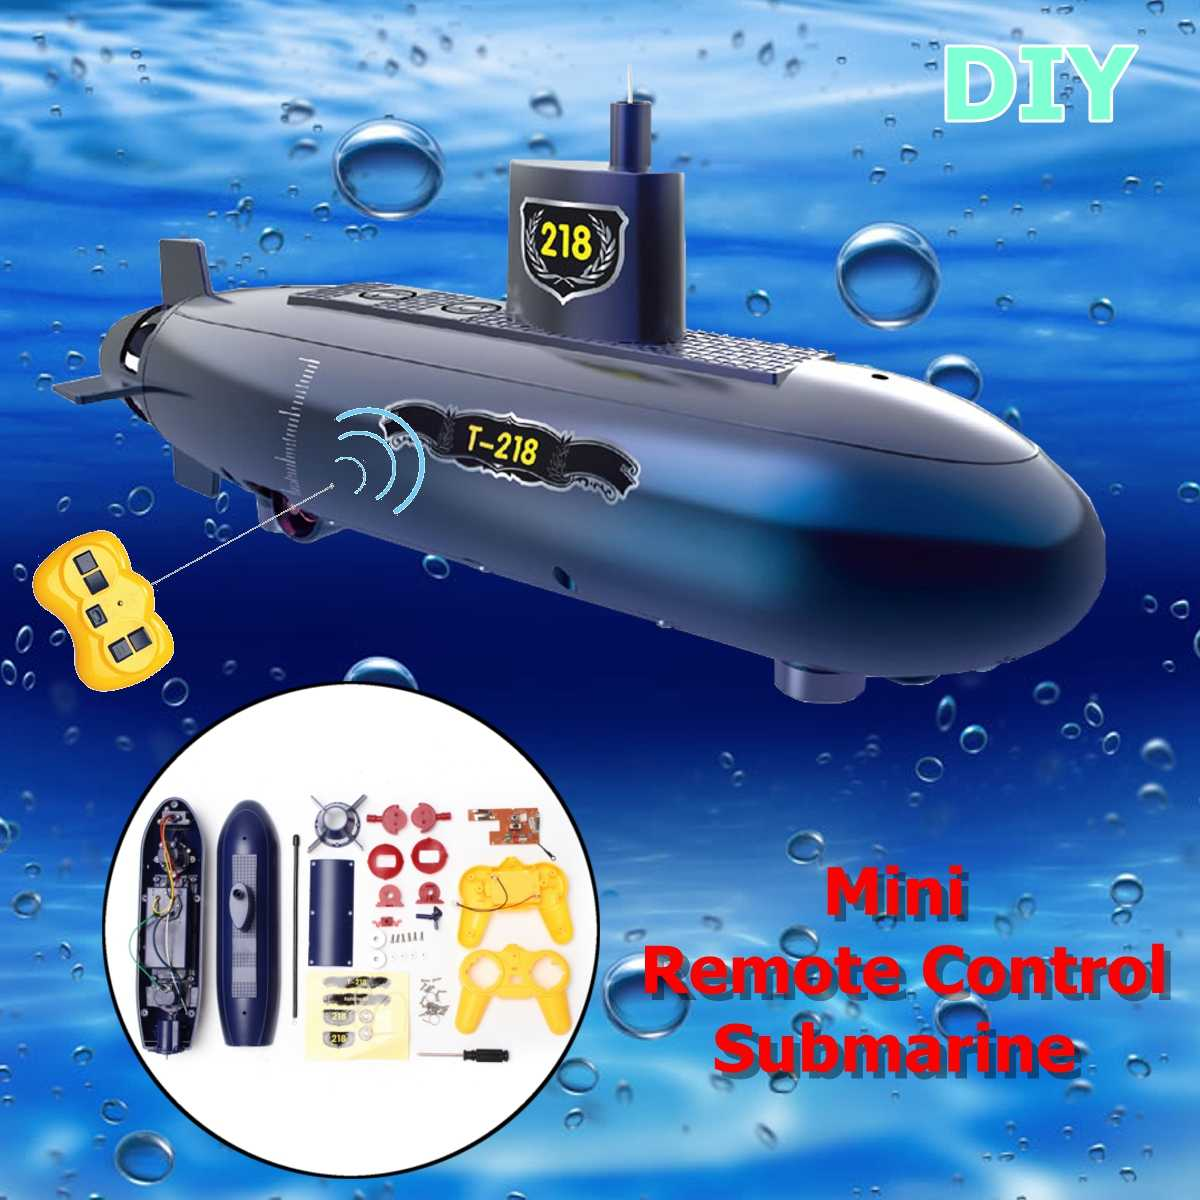 Funny RC Mini Submarine 6 Channels Remote Control Under